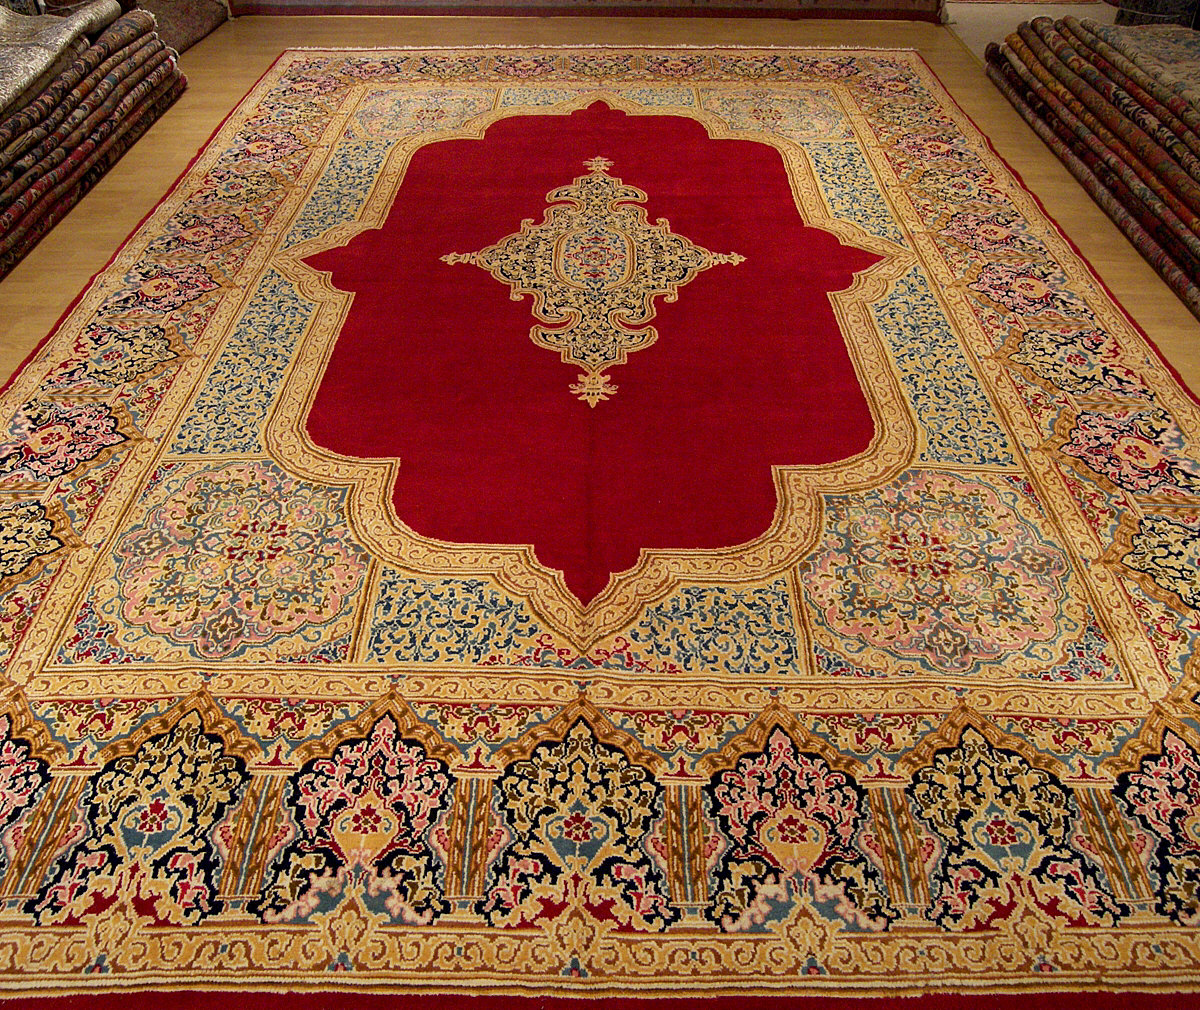 10x14 Handmade Antique Persian Lavar Kerman Rug 1883